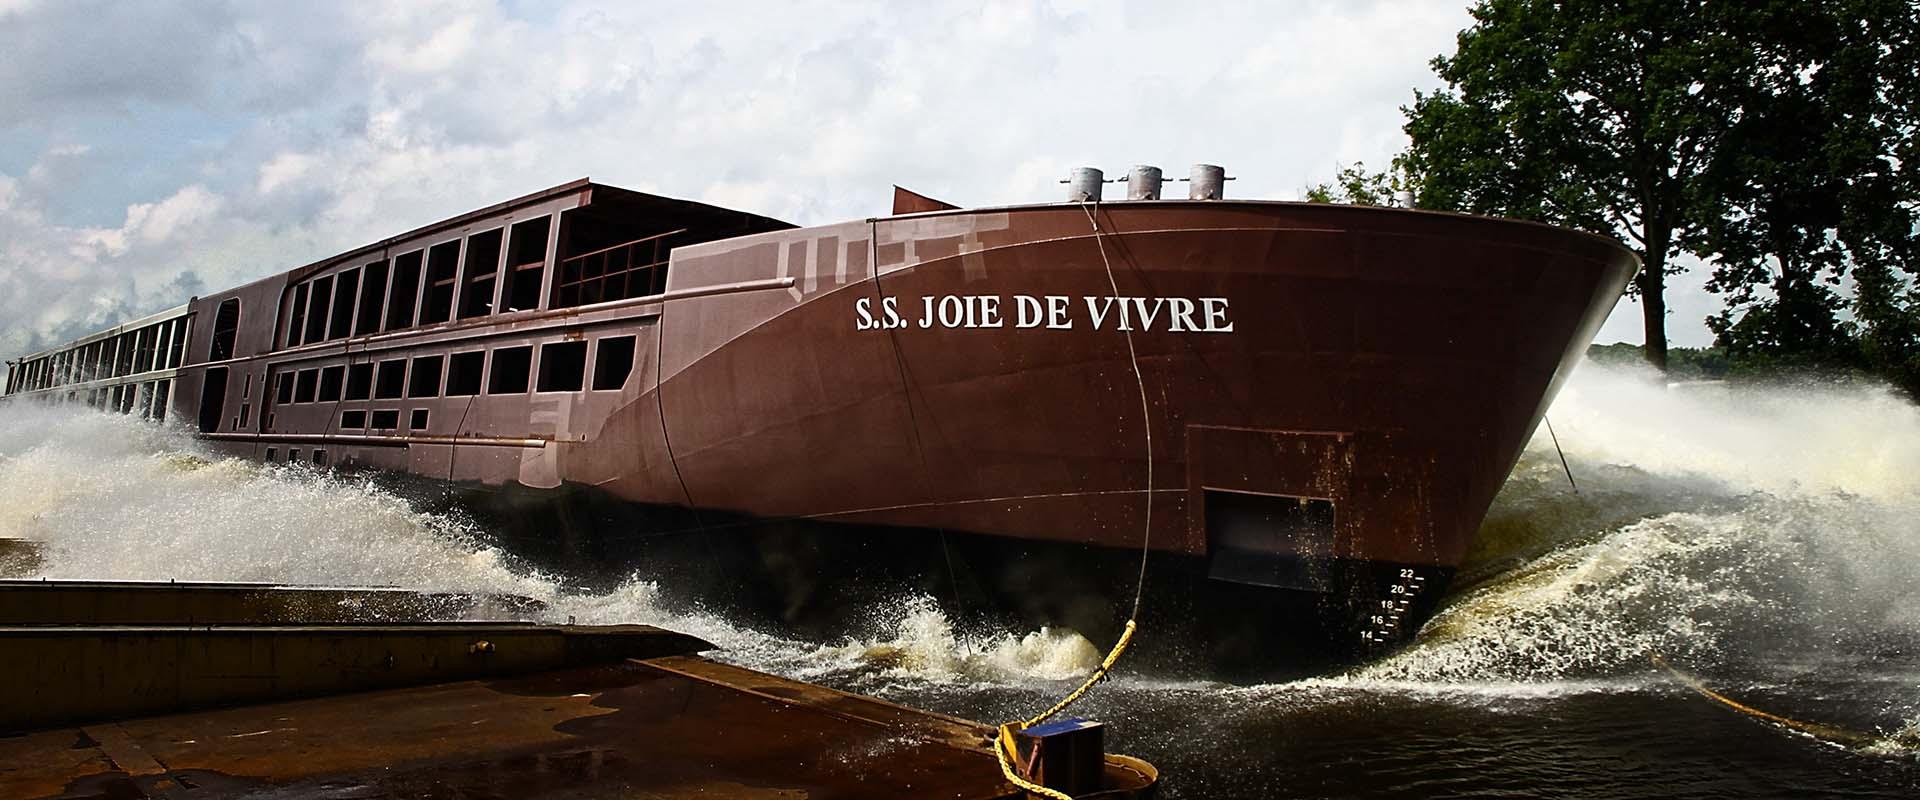 S.S. JOIE DE VIVRE bei Stapellauf.